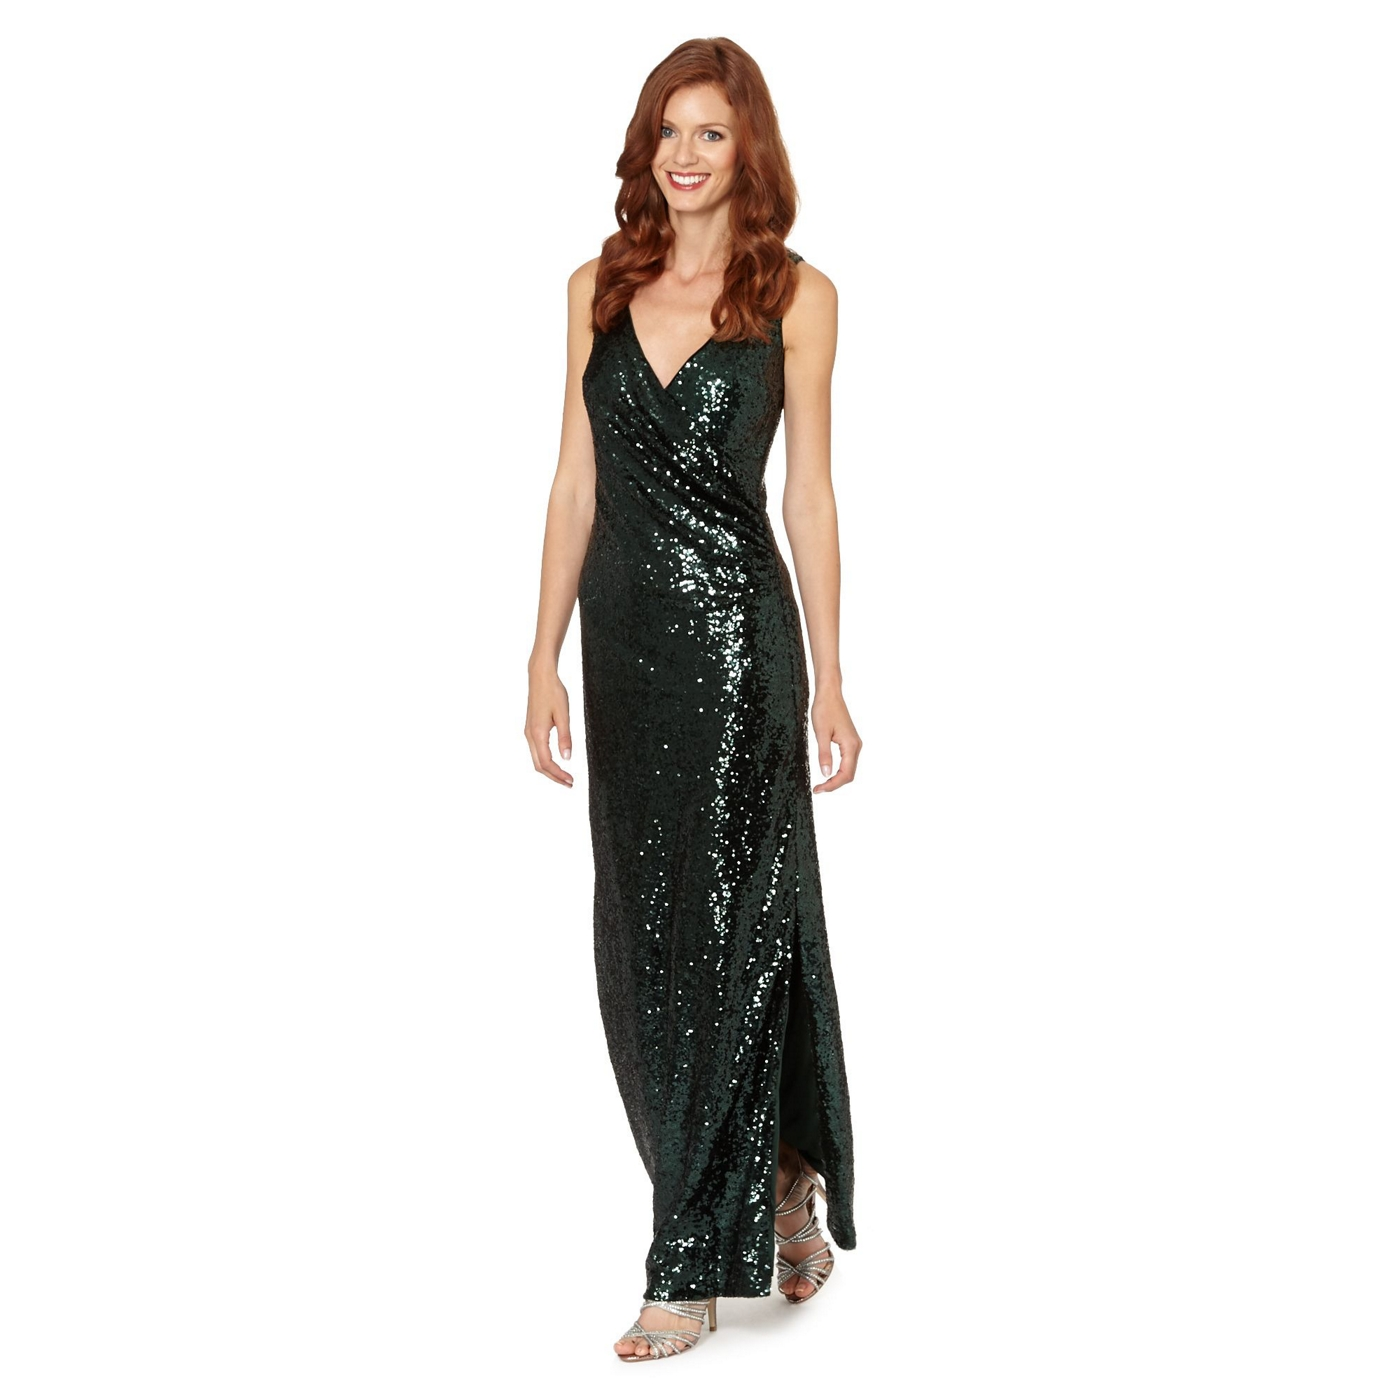 7f504b8fdb606 Debut Dark green sleeveless sequin maxi dress on PopScreen